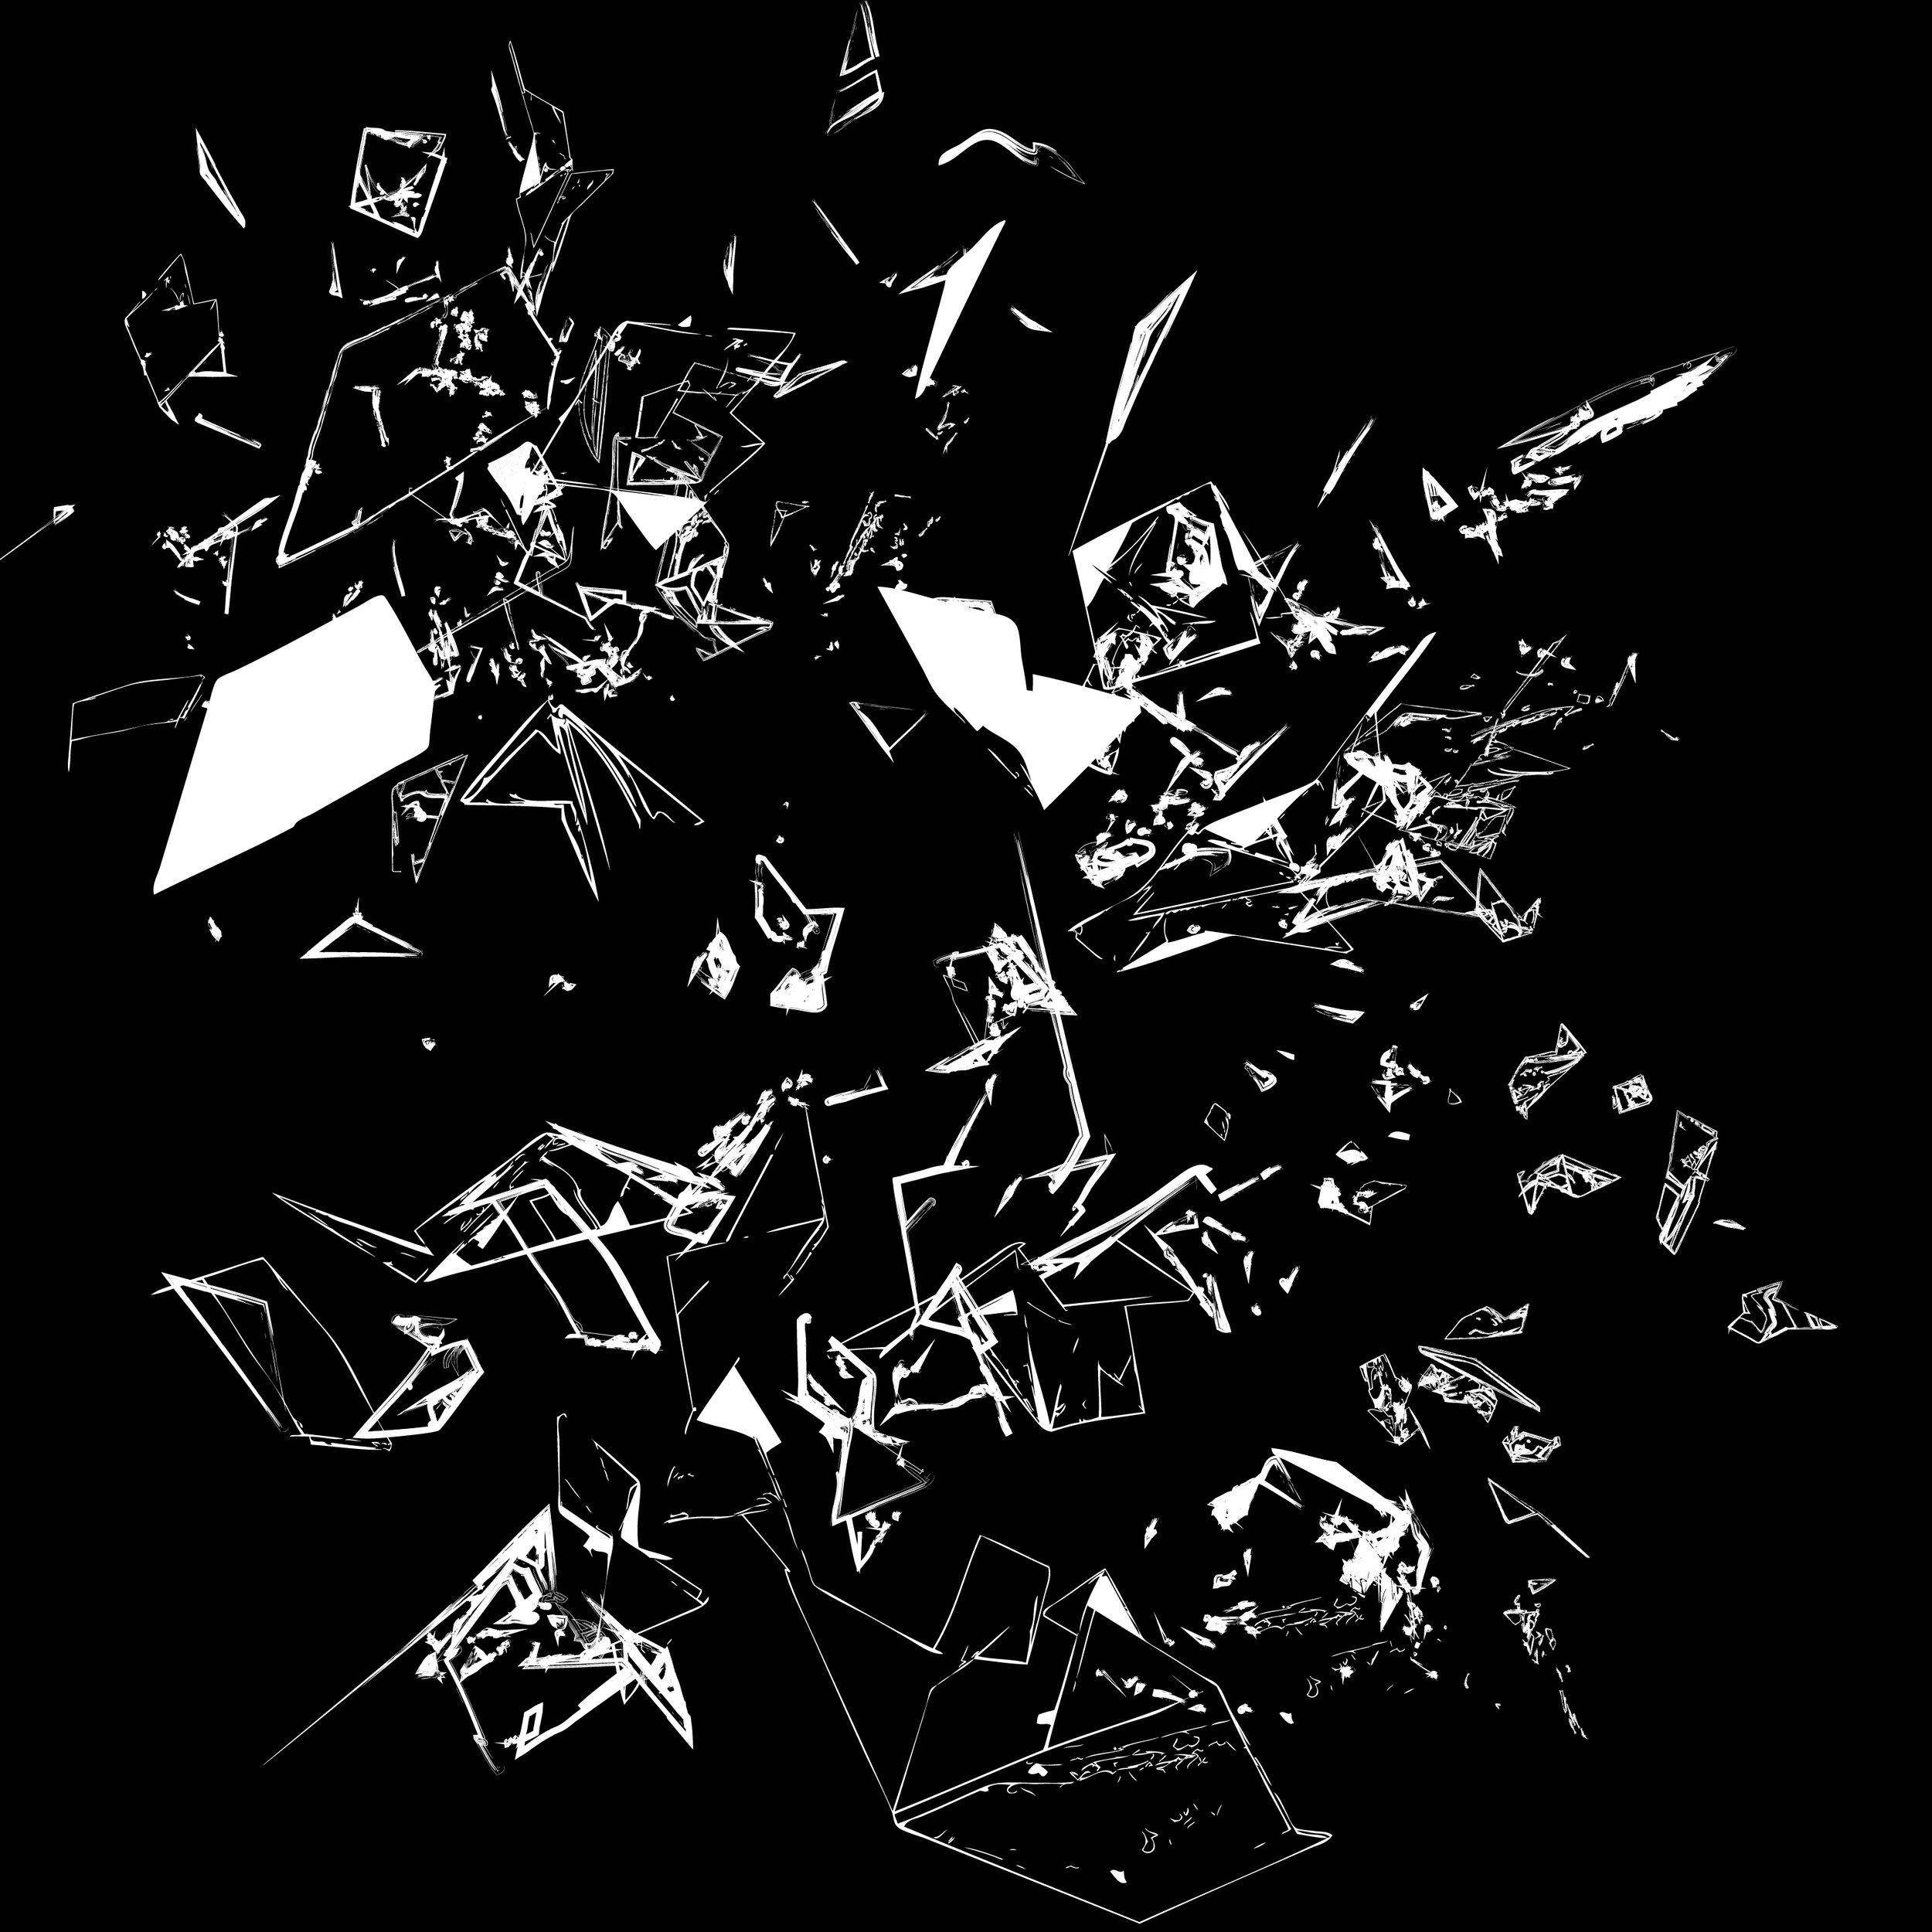 Absolut_X_fractal_wht.jpg